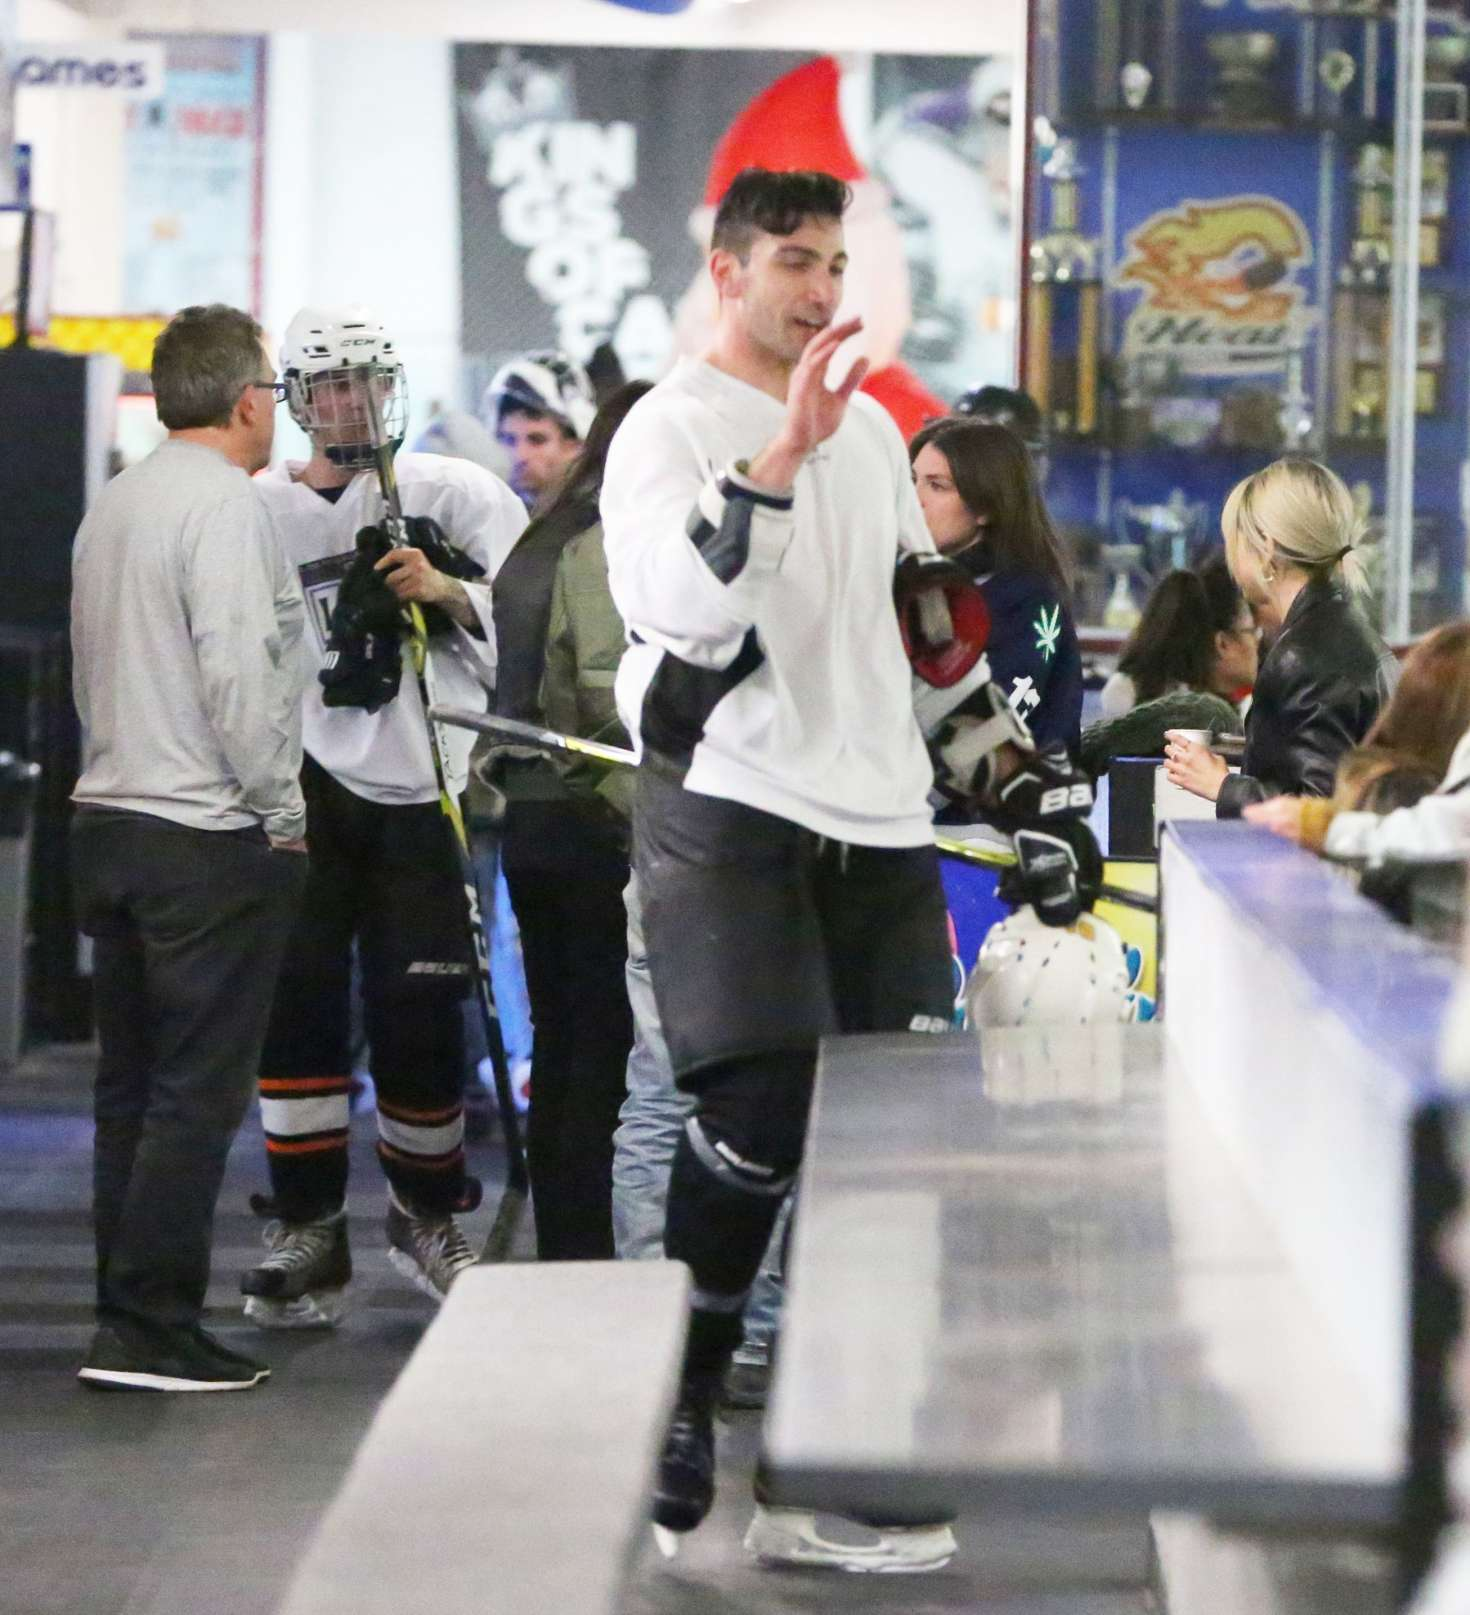 Selena Gomez 2017 : Selena Gomez: Supports Justin Bieber at his hockey game -11